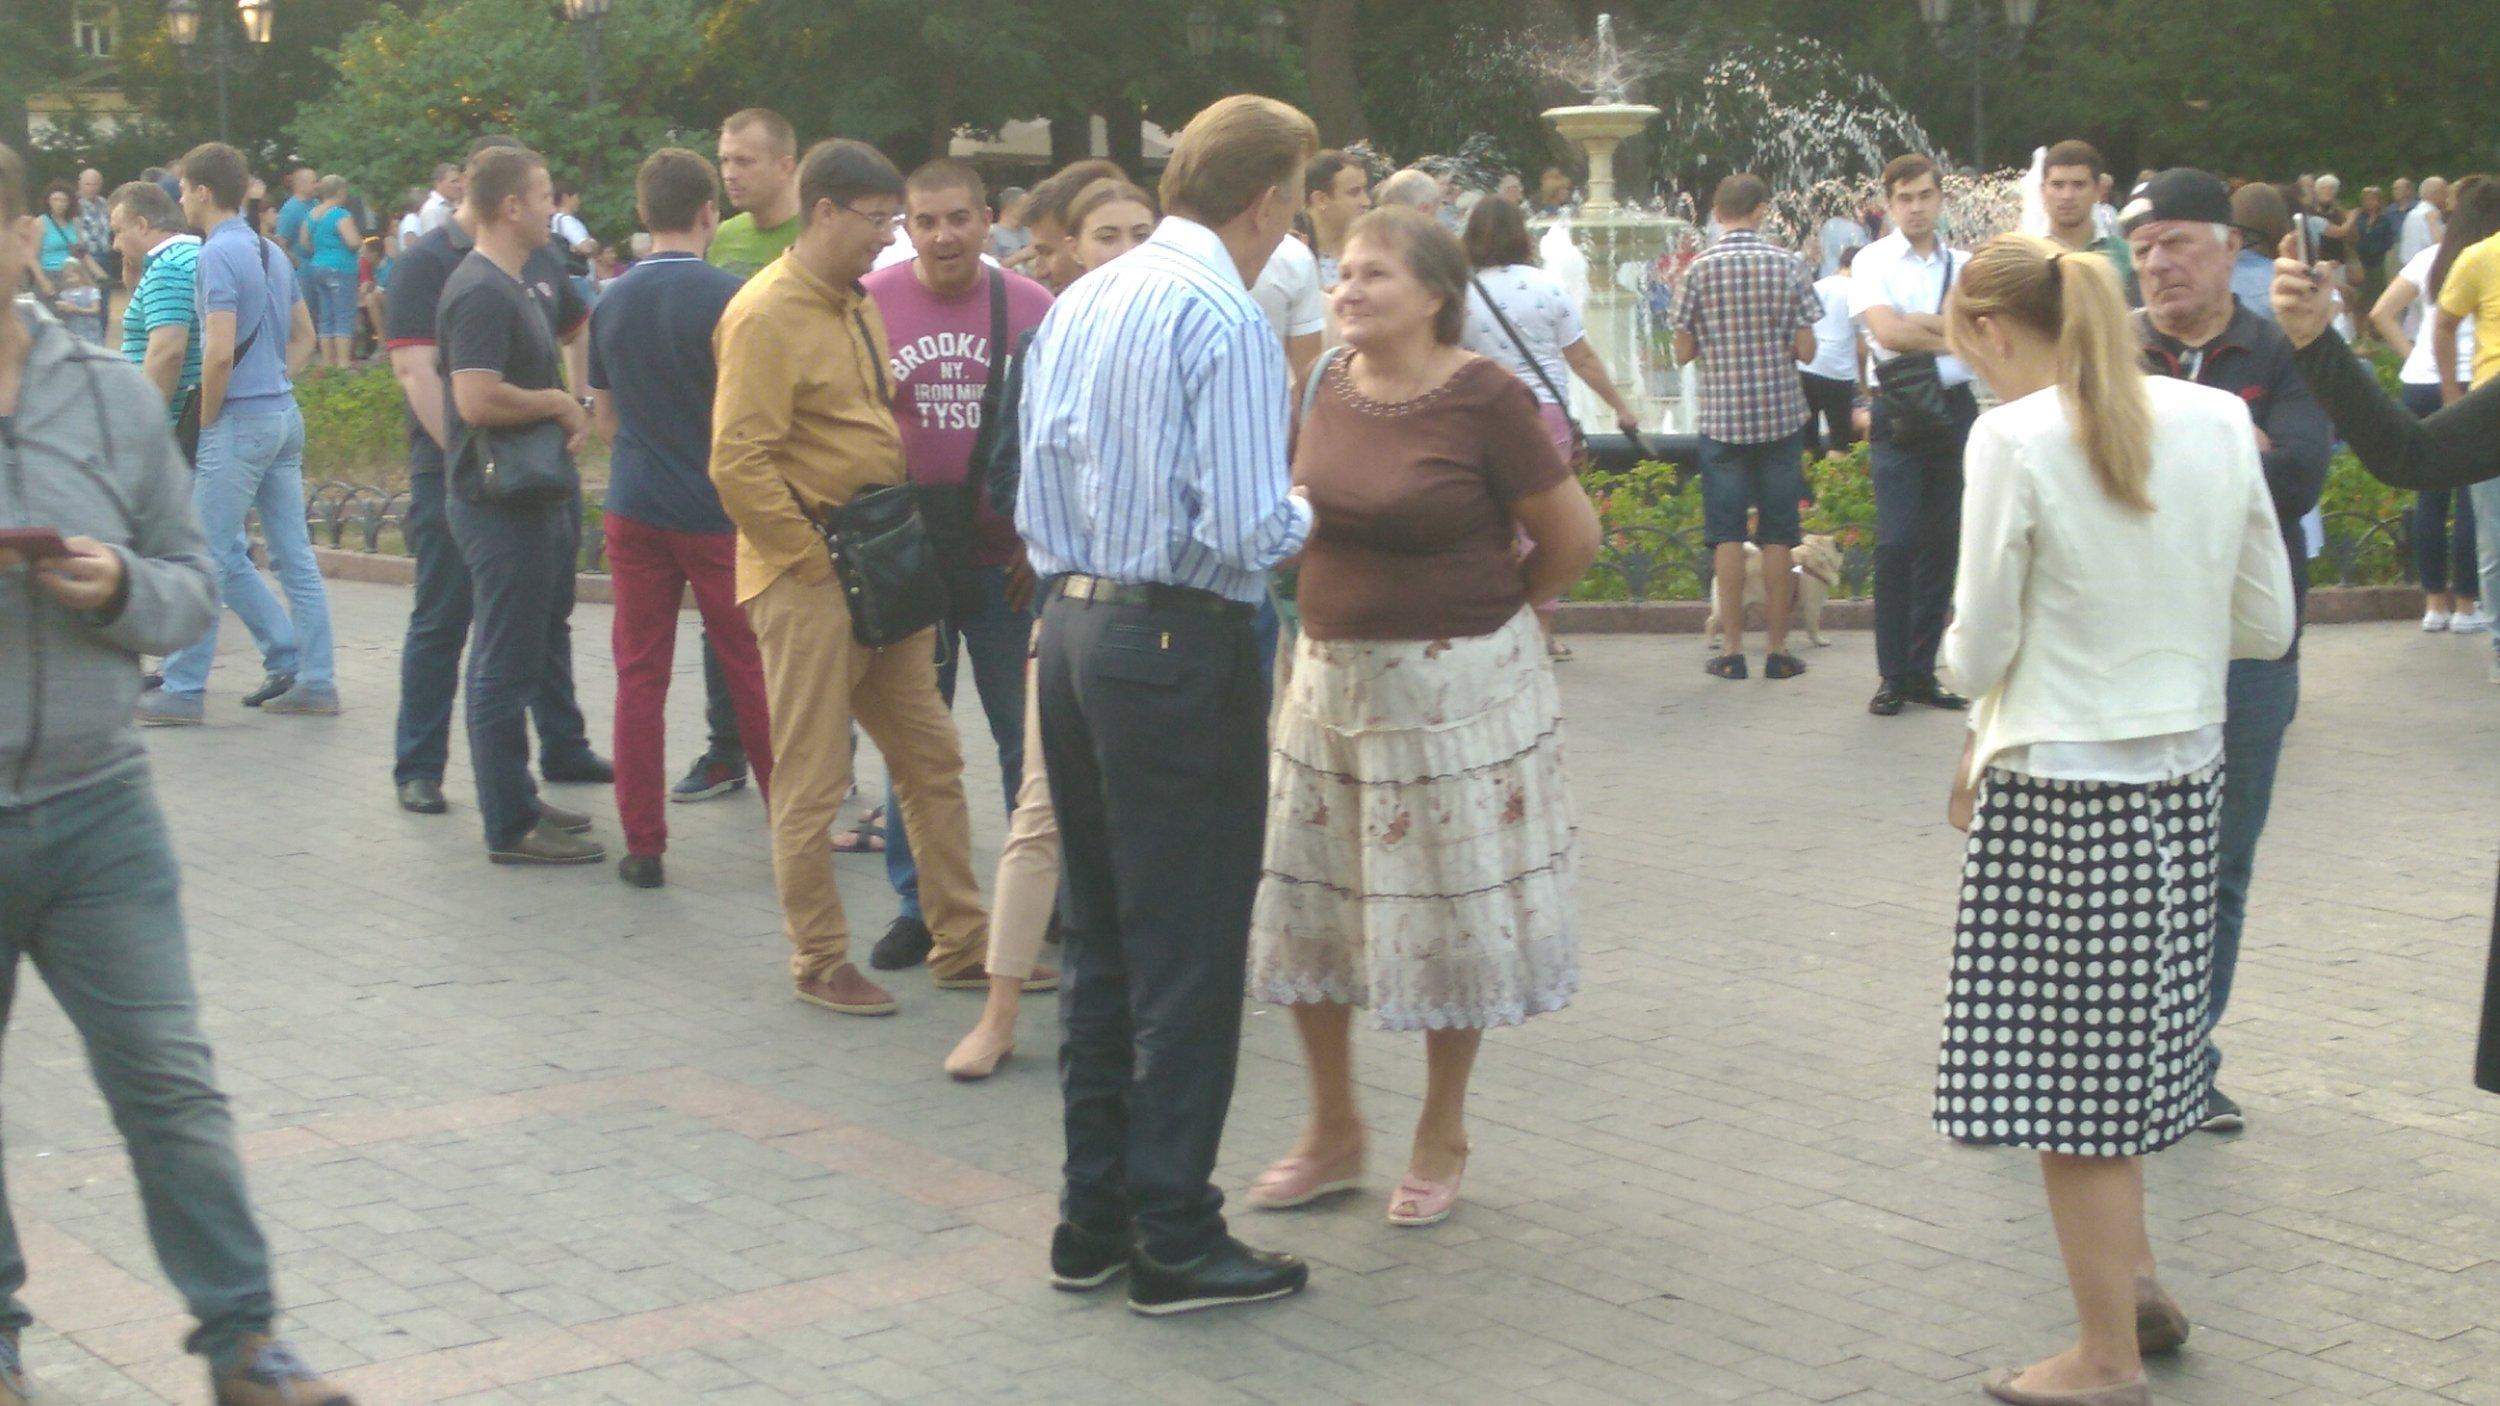 Kivalov speaks to a constituent